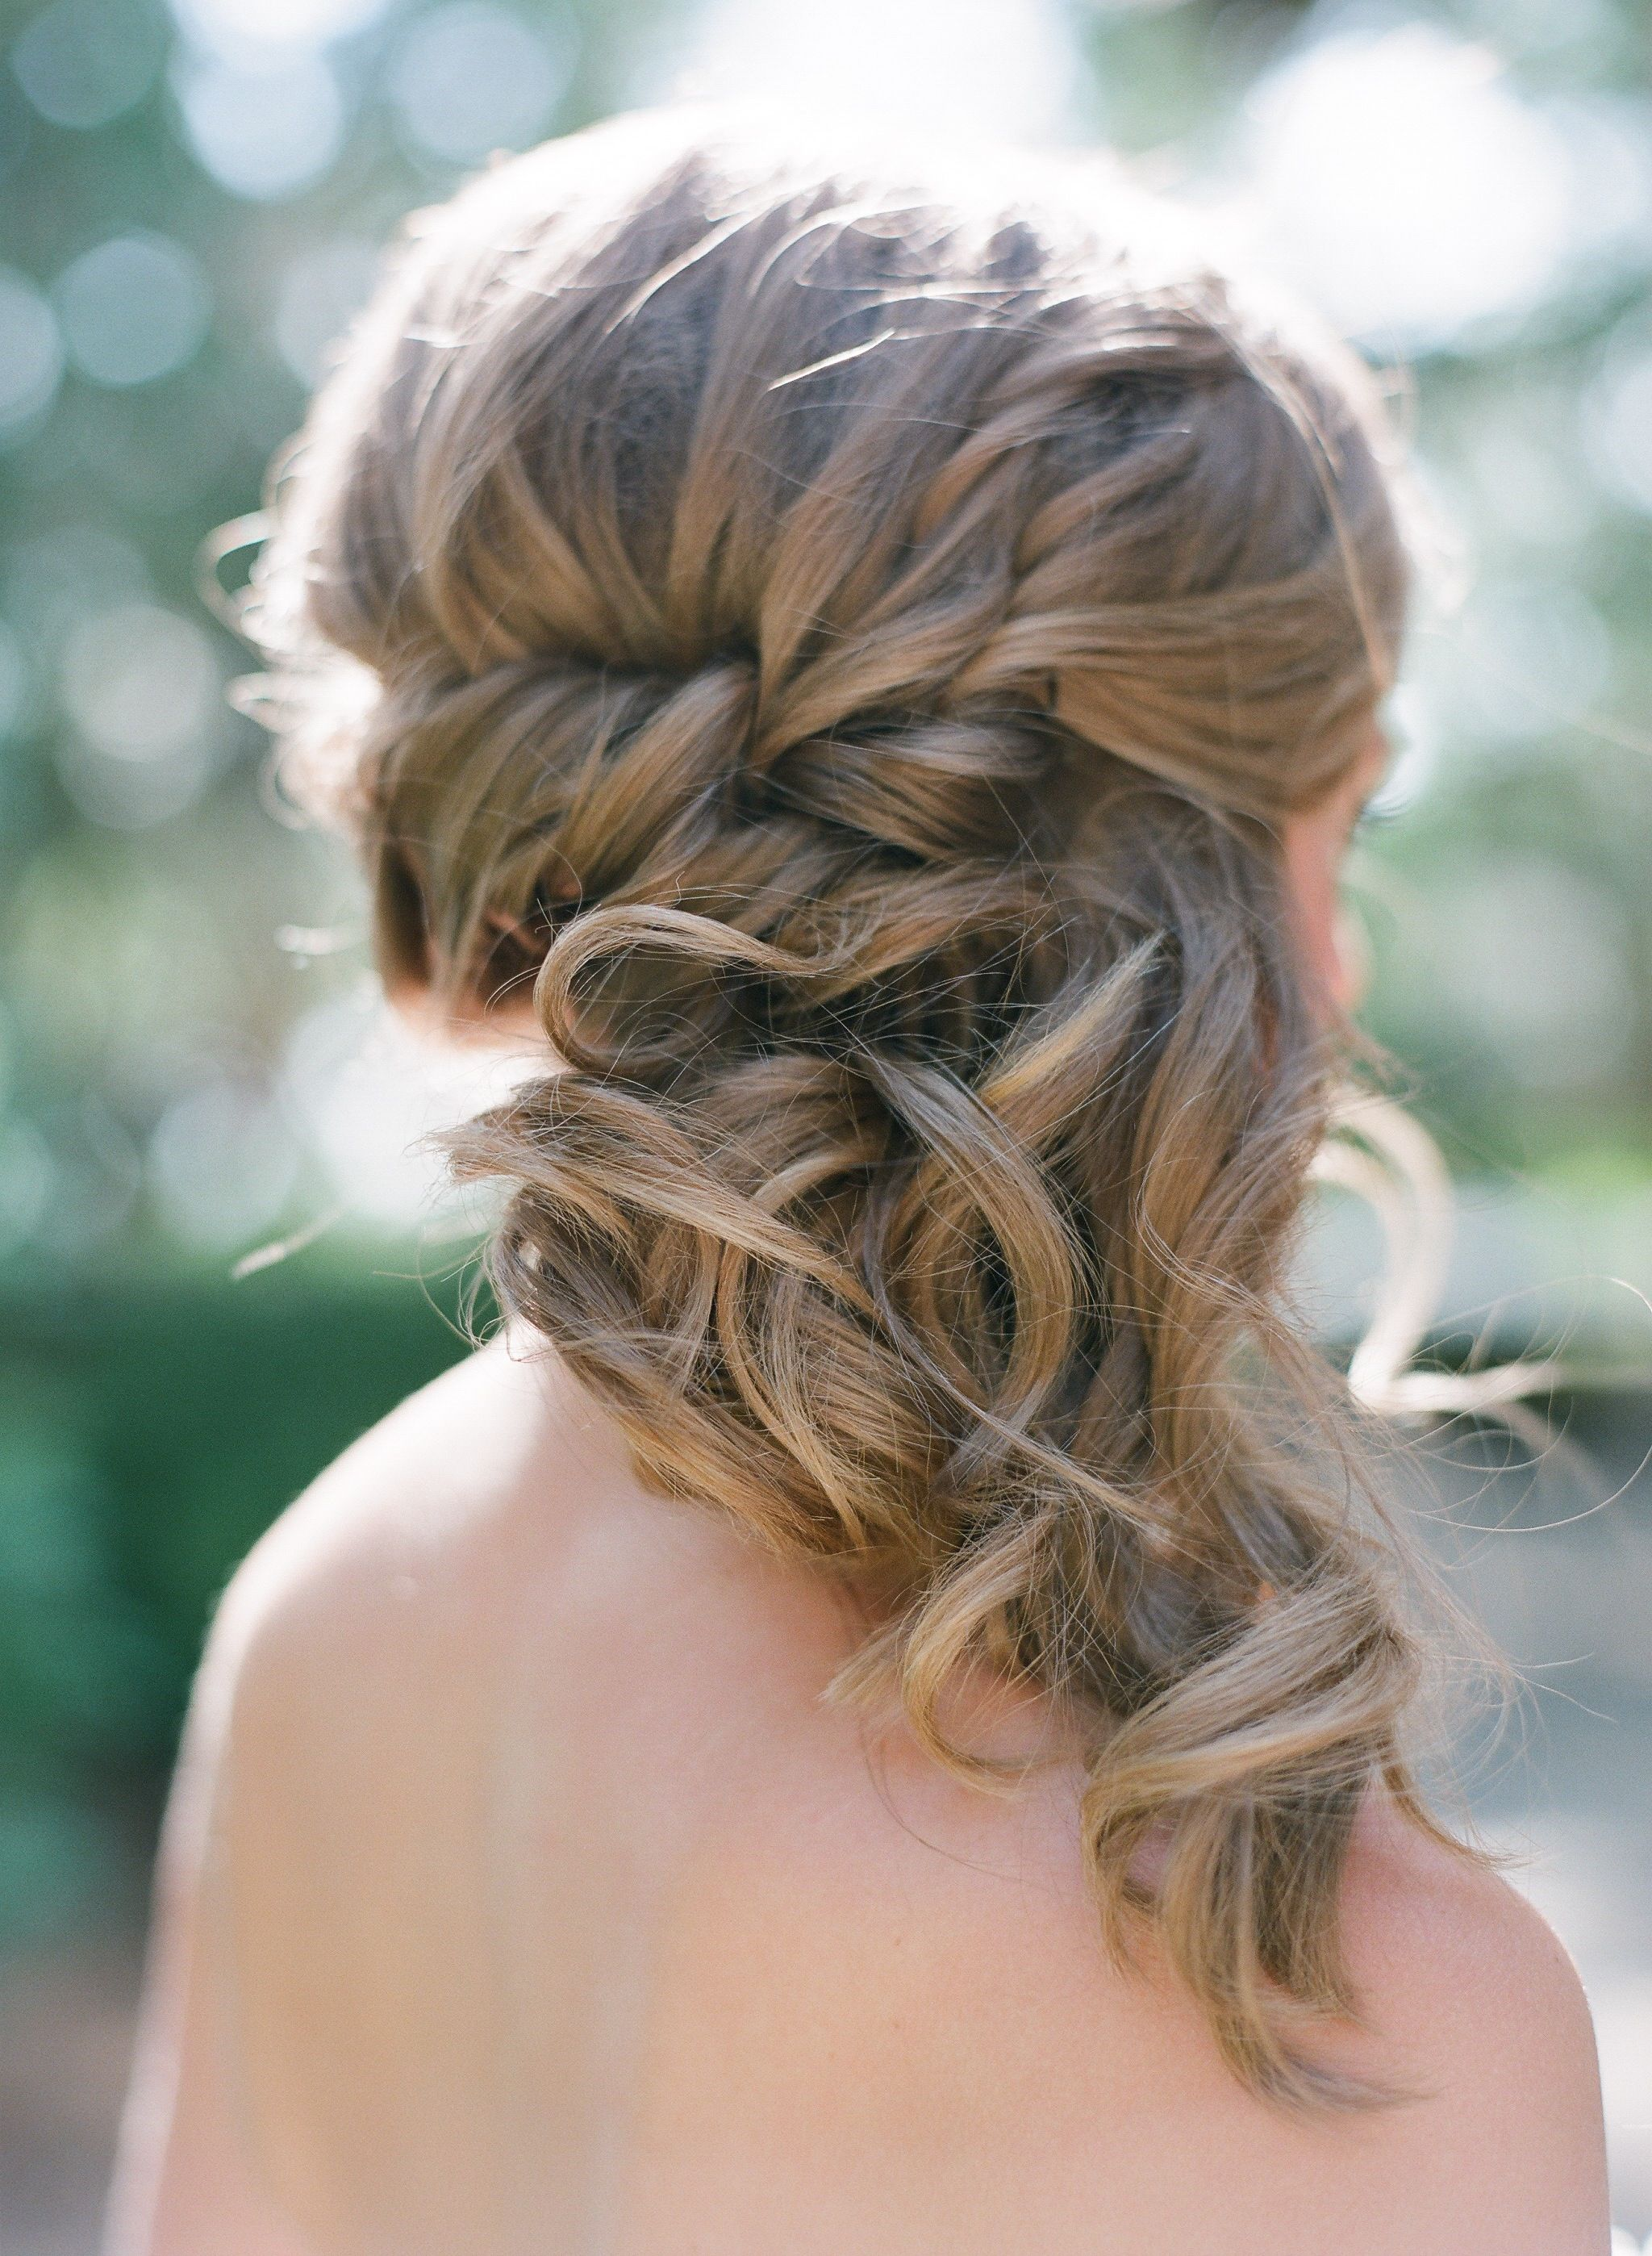 side pony bridesmaid style updo wedding | hair&beauty | pinterest